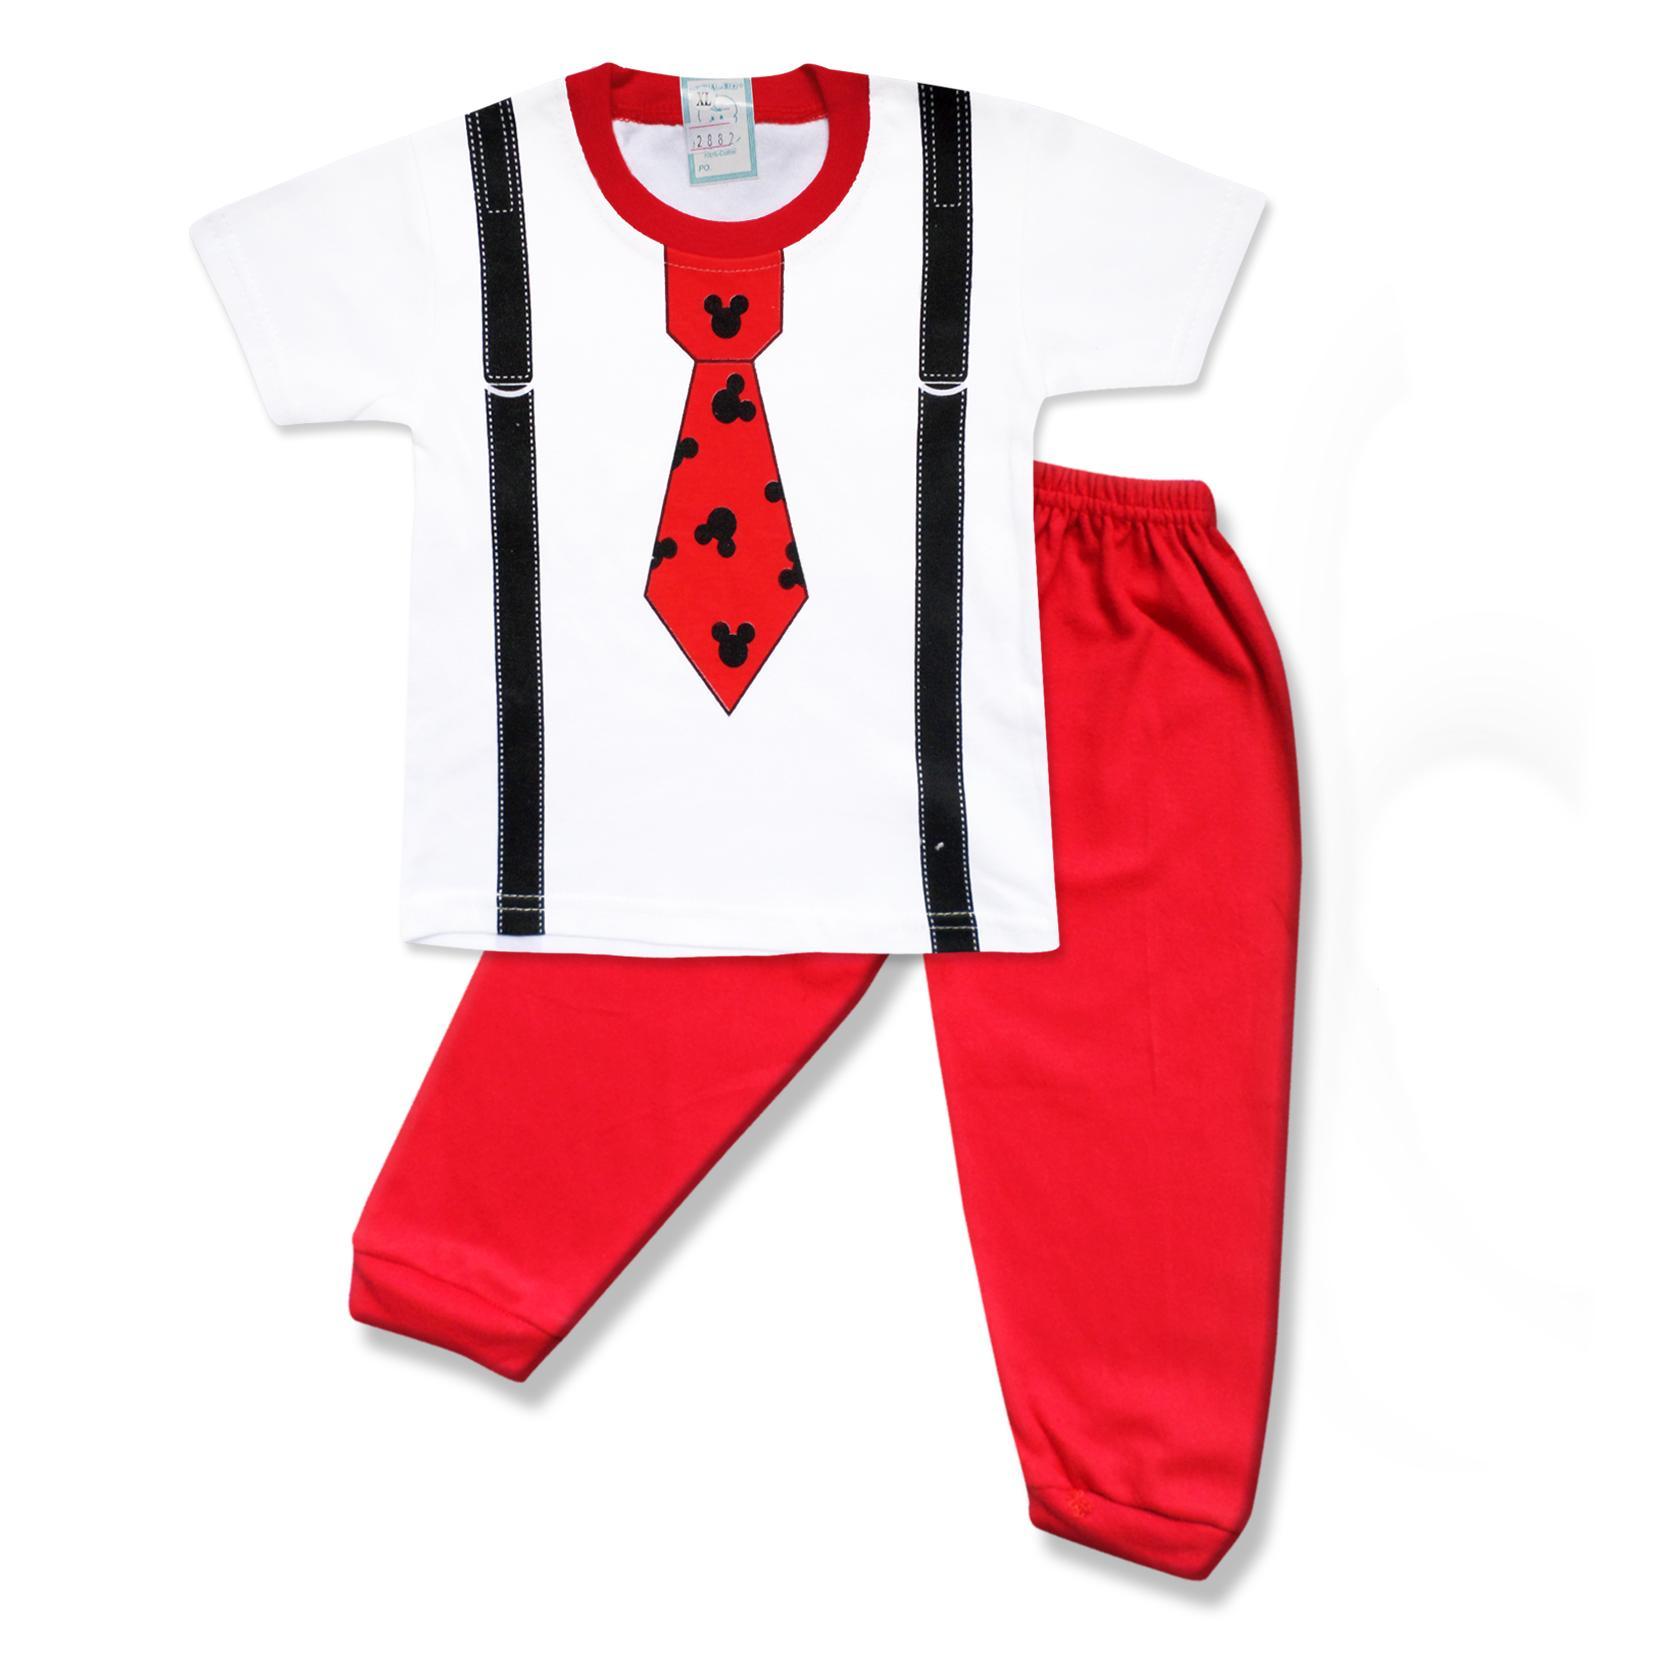 Skabe Baby Warna Tua Baju Tangan Pendek Anak Laki Laki Setelan Kaos Celana Jogger 2882